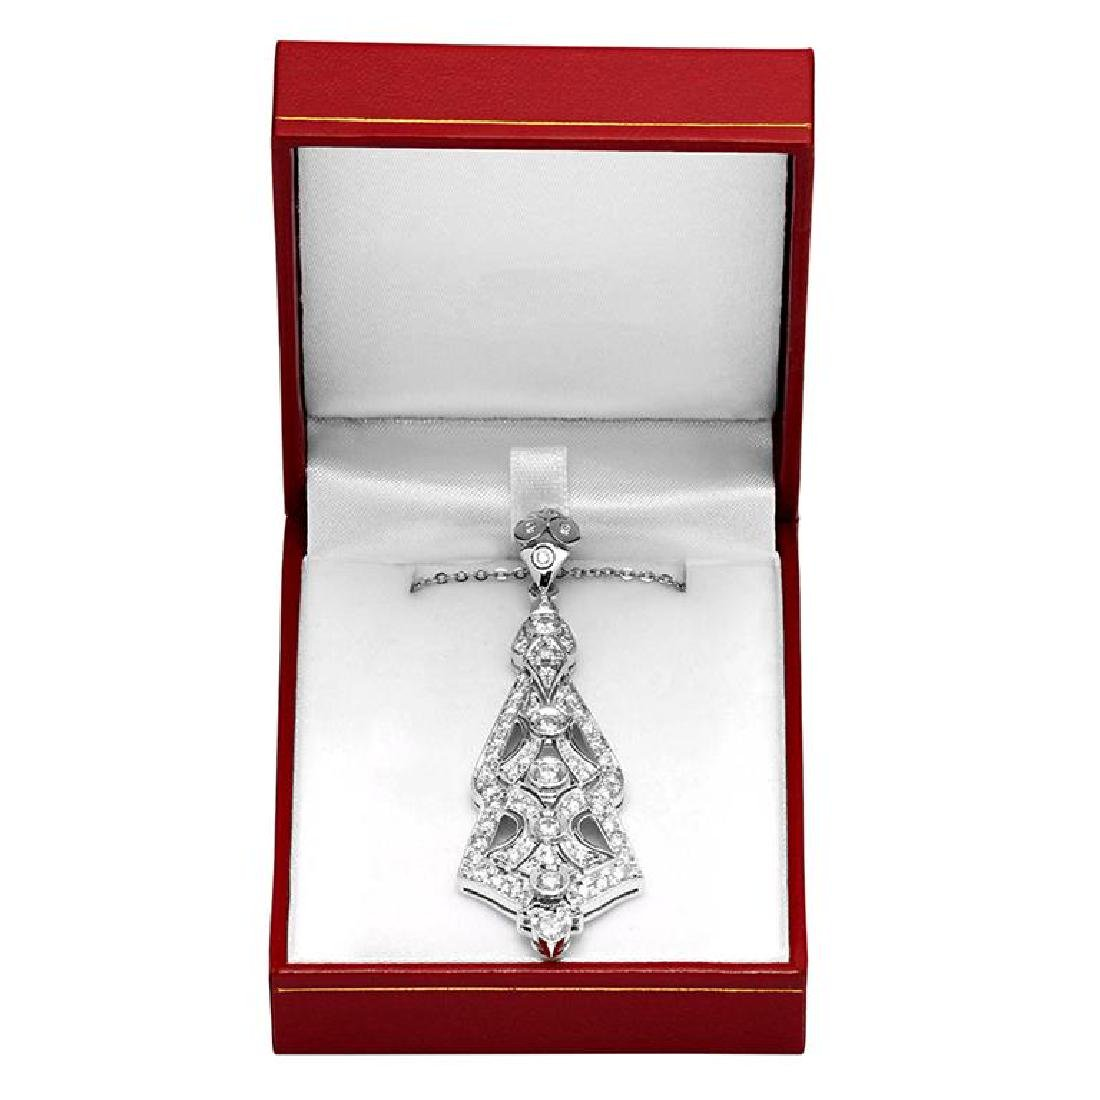 14k White Gold 2.56ct Diamond Pendant - 3